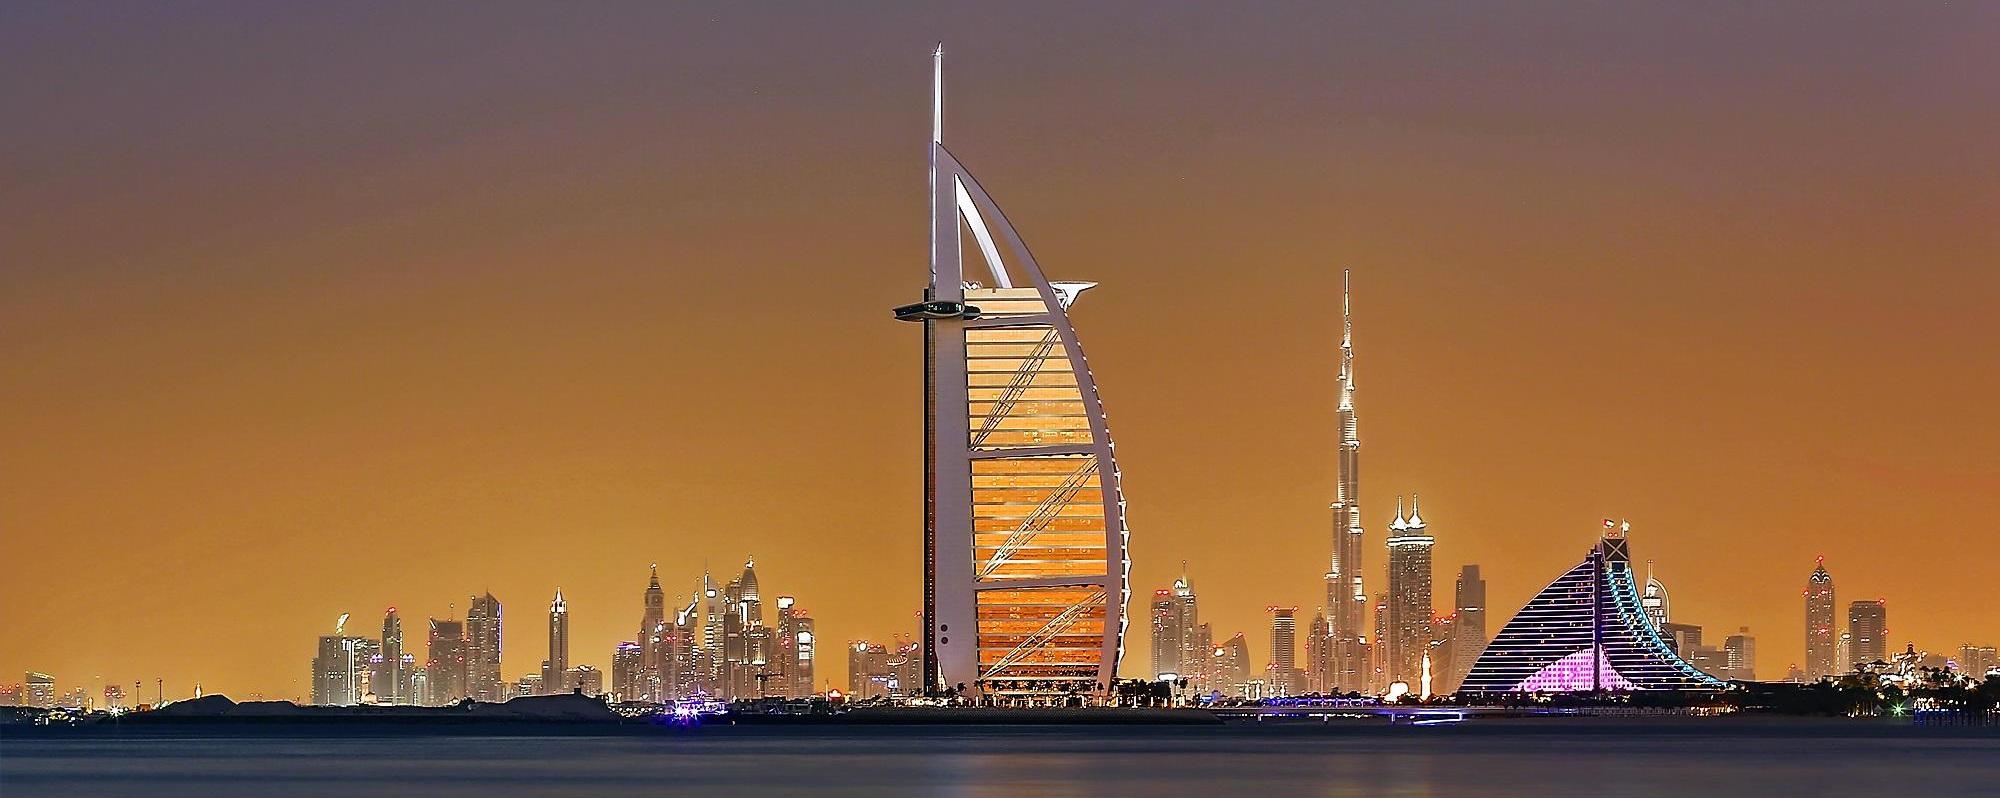 Dubai-skyline-eZhire-Rent-A-Car-Mobile-App.jpg